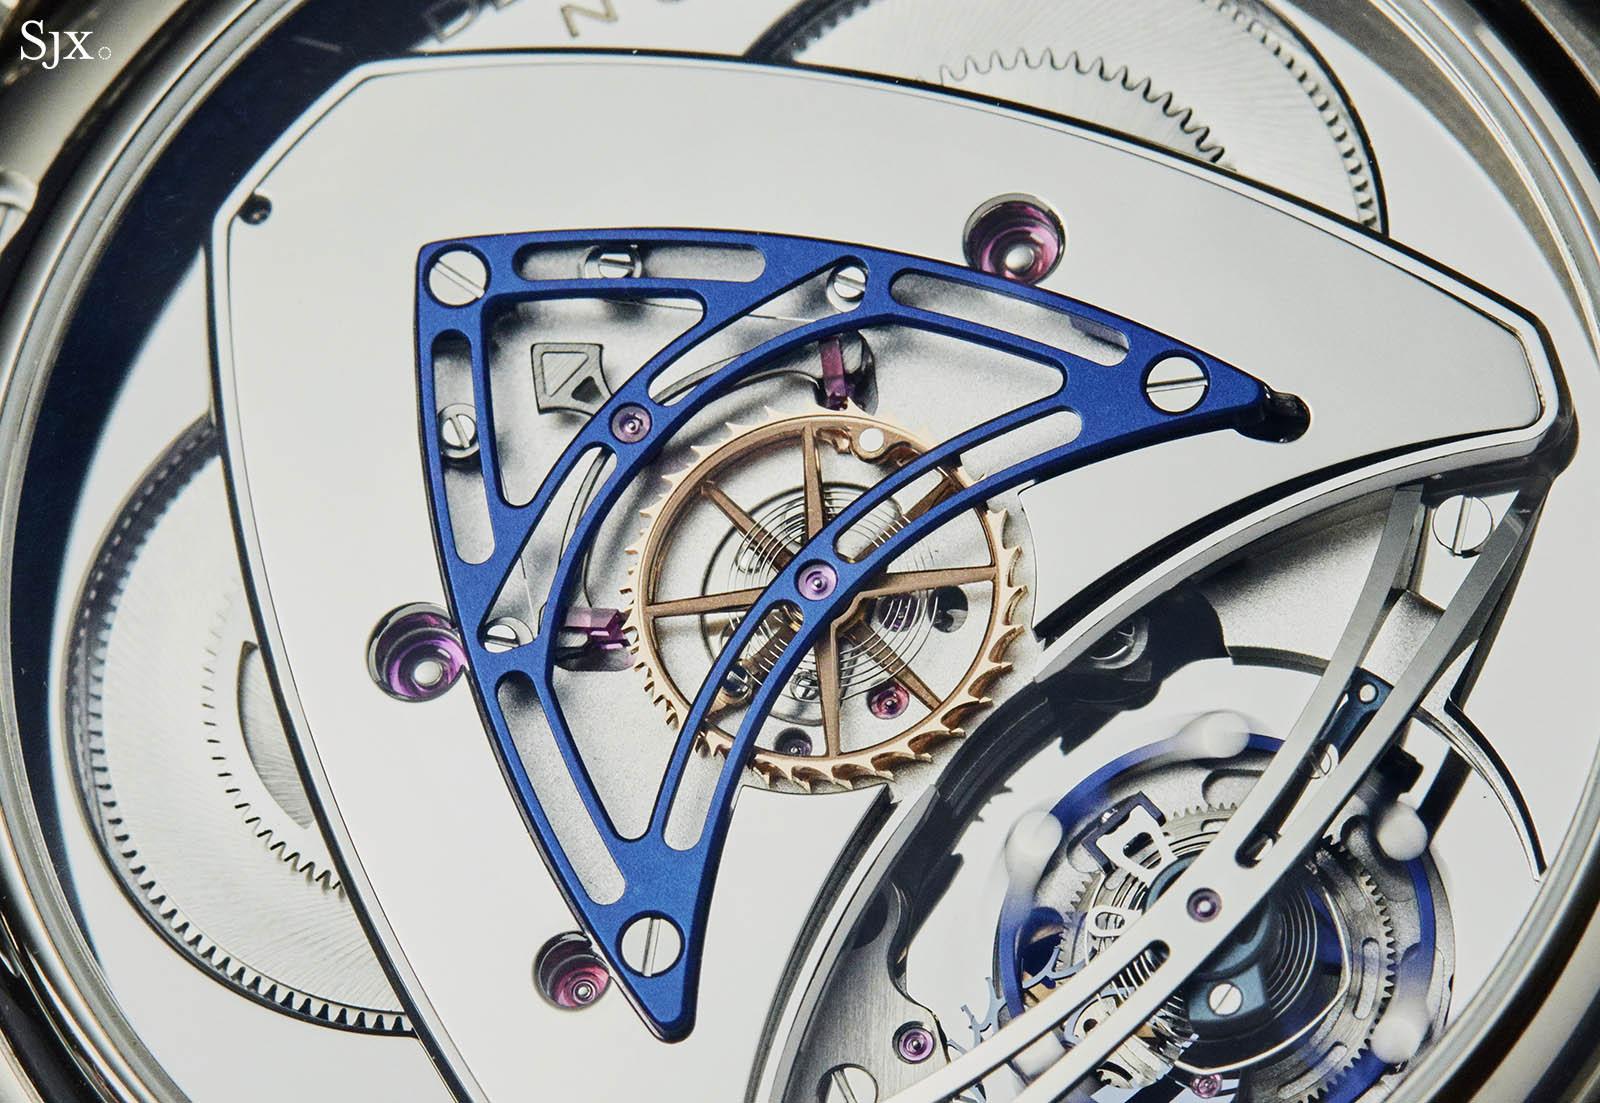 De Bethune DB25 Starry Varius Chronomètre Tourbillon_8